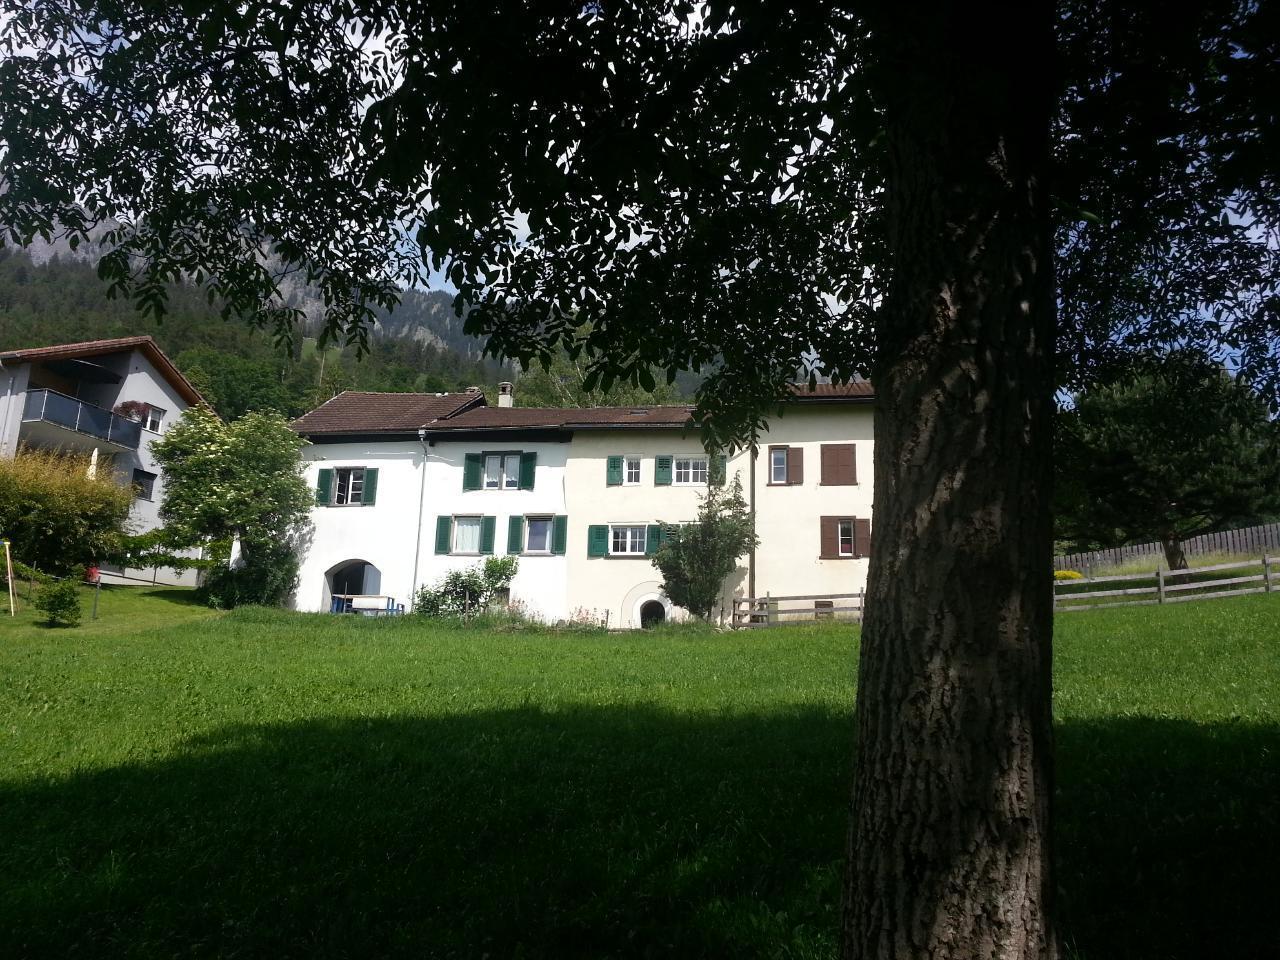 Maison de vacances Heidihuus - Ferienhaus*** im sonnigen Heidiland (817543), Maienfeld, Pays d'Heidi, Suisse Orientale, Suisse, image 13